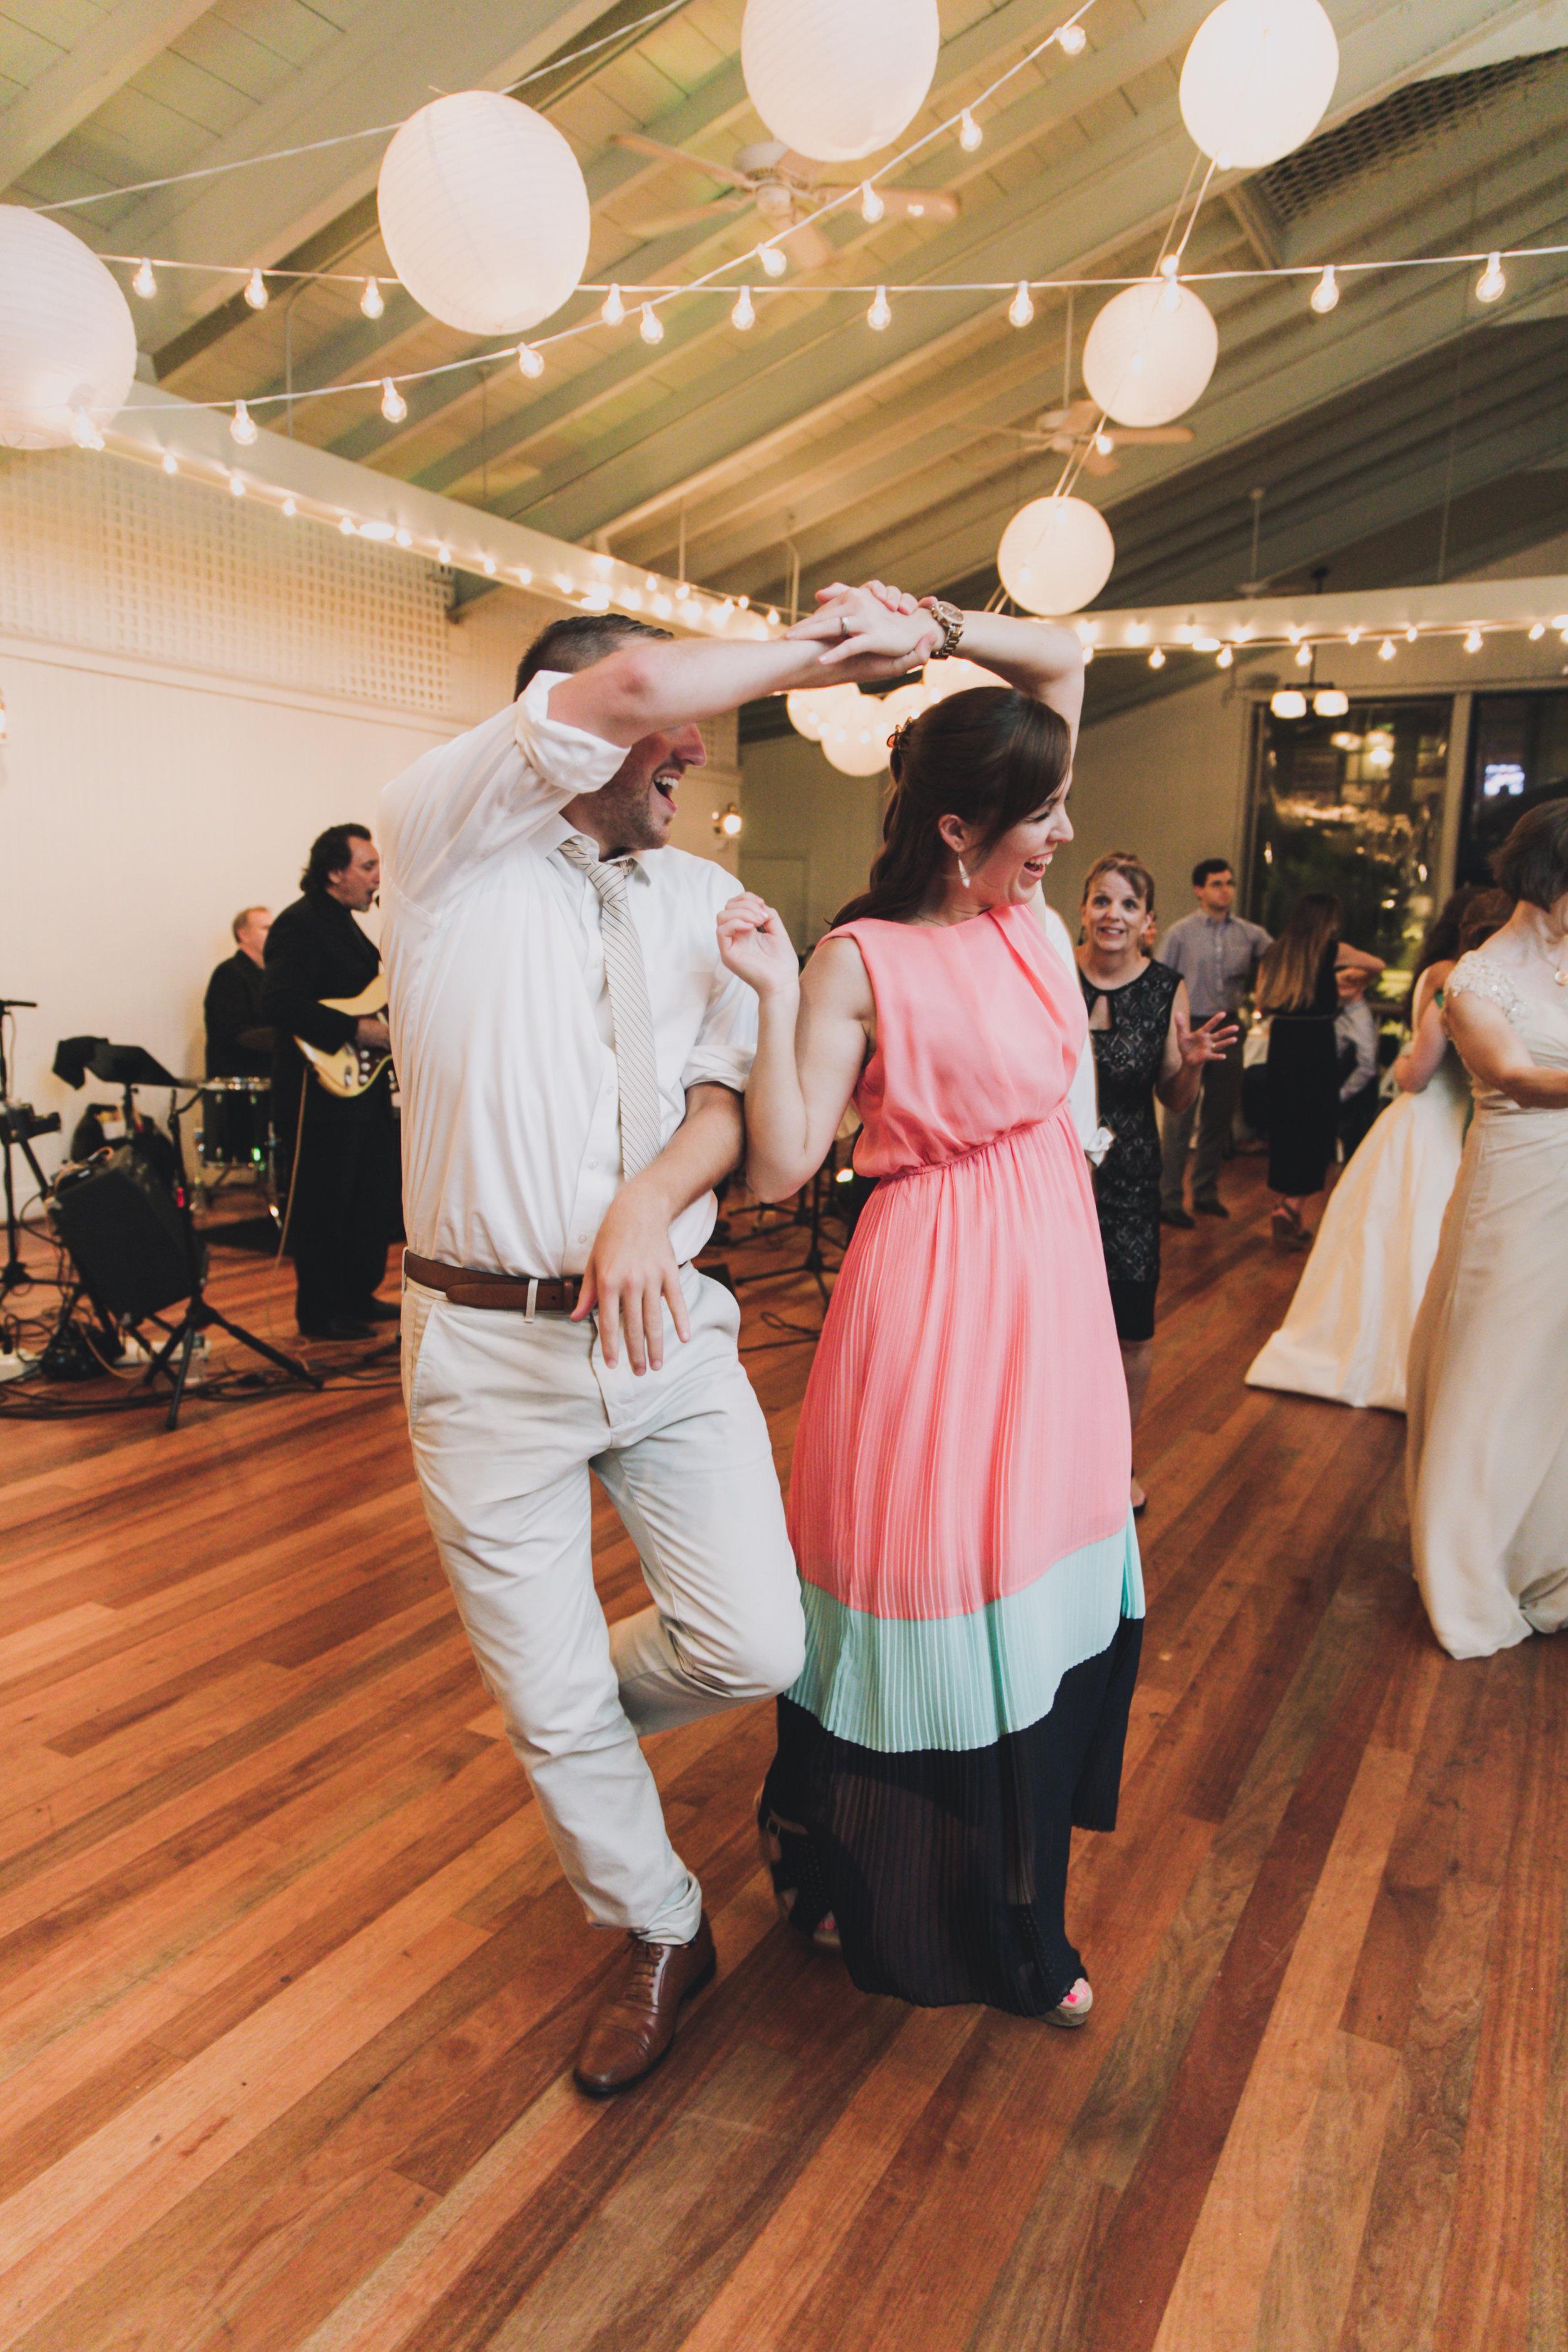 Madeleine_Matt_Wedding_Slideshow_Jpegs-233.jpg